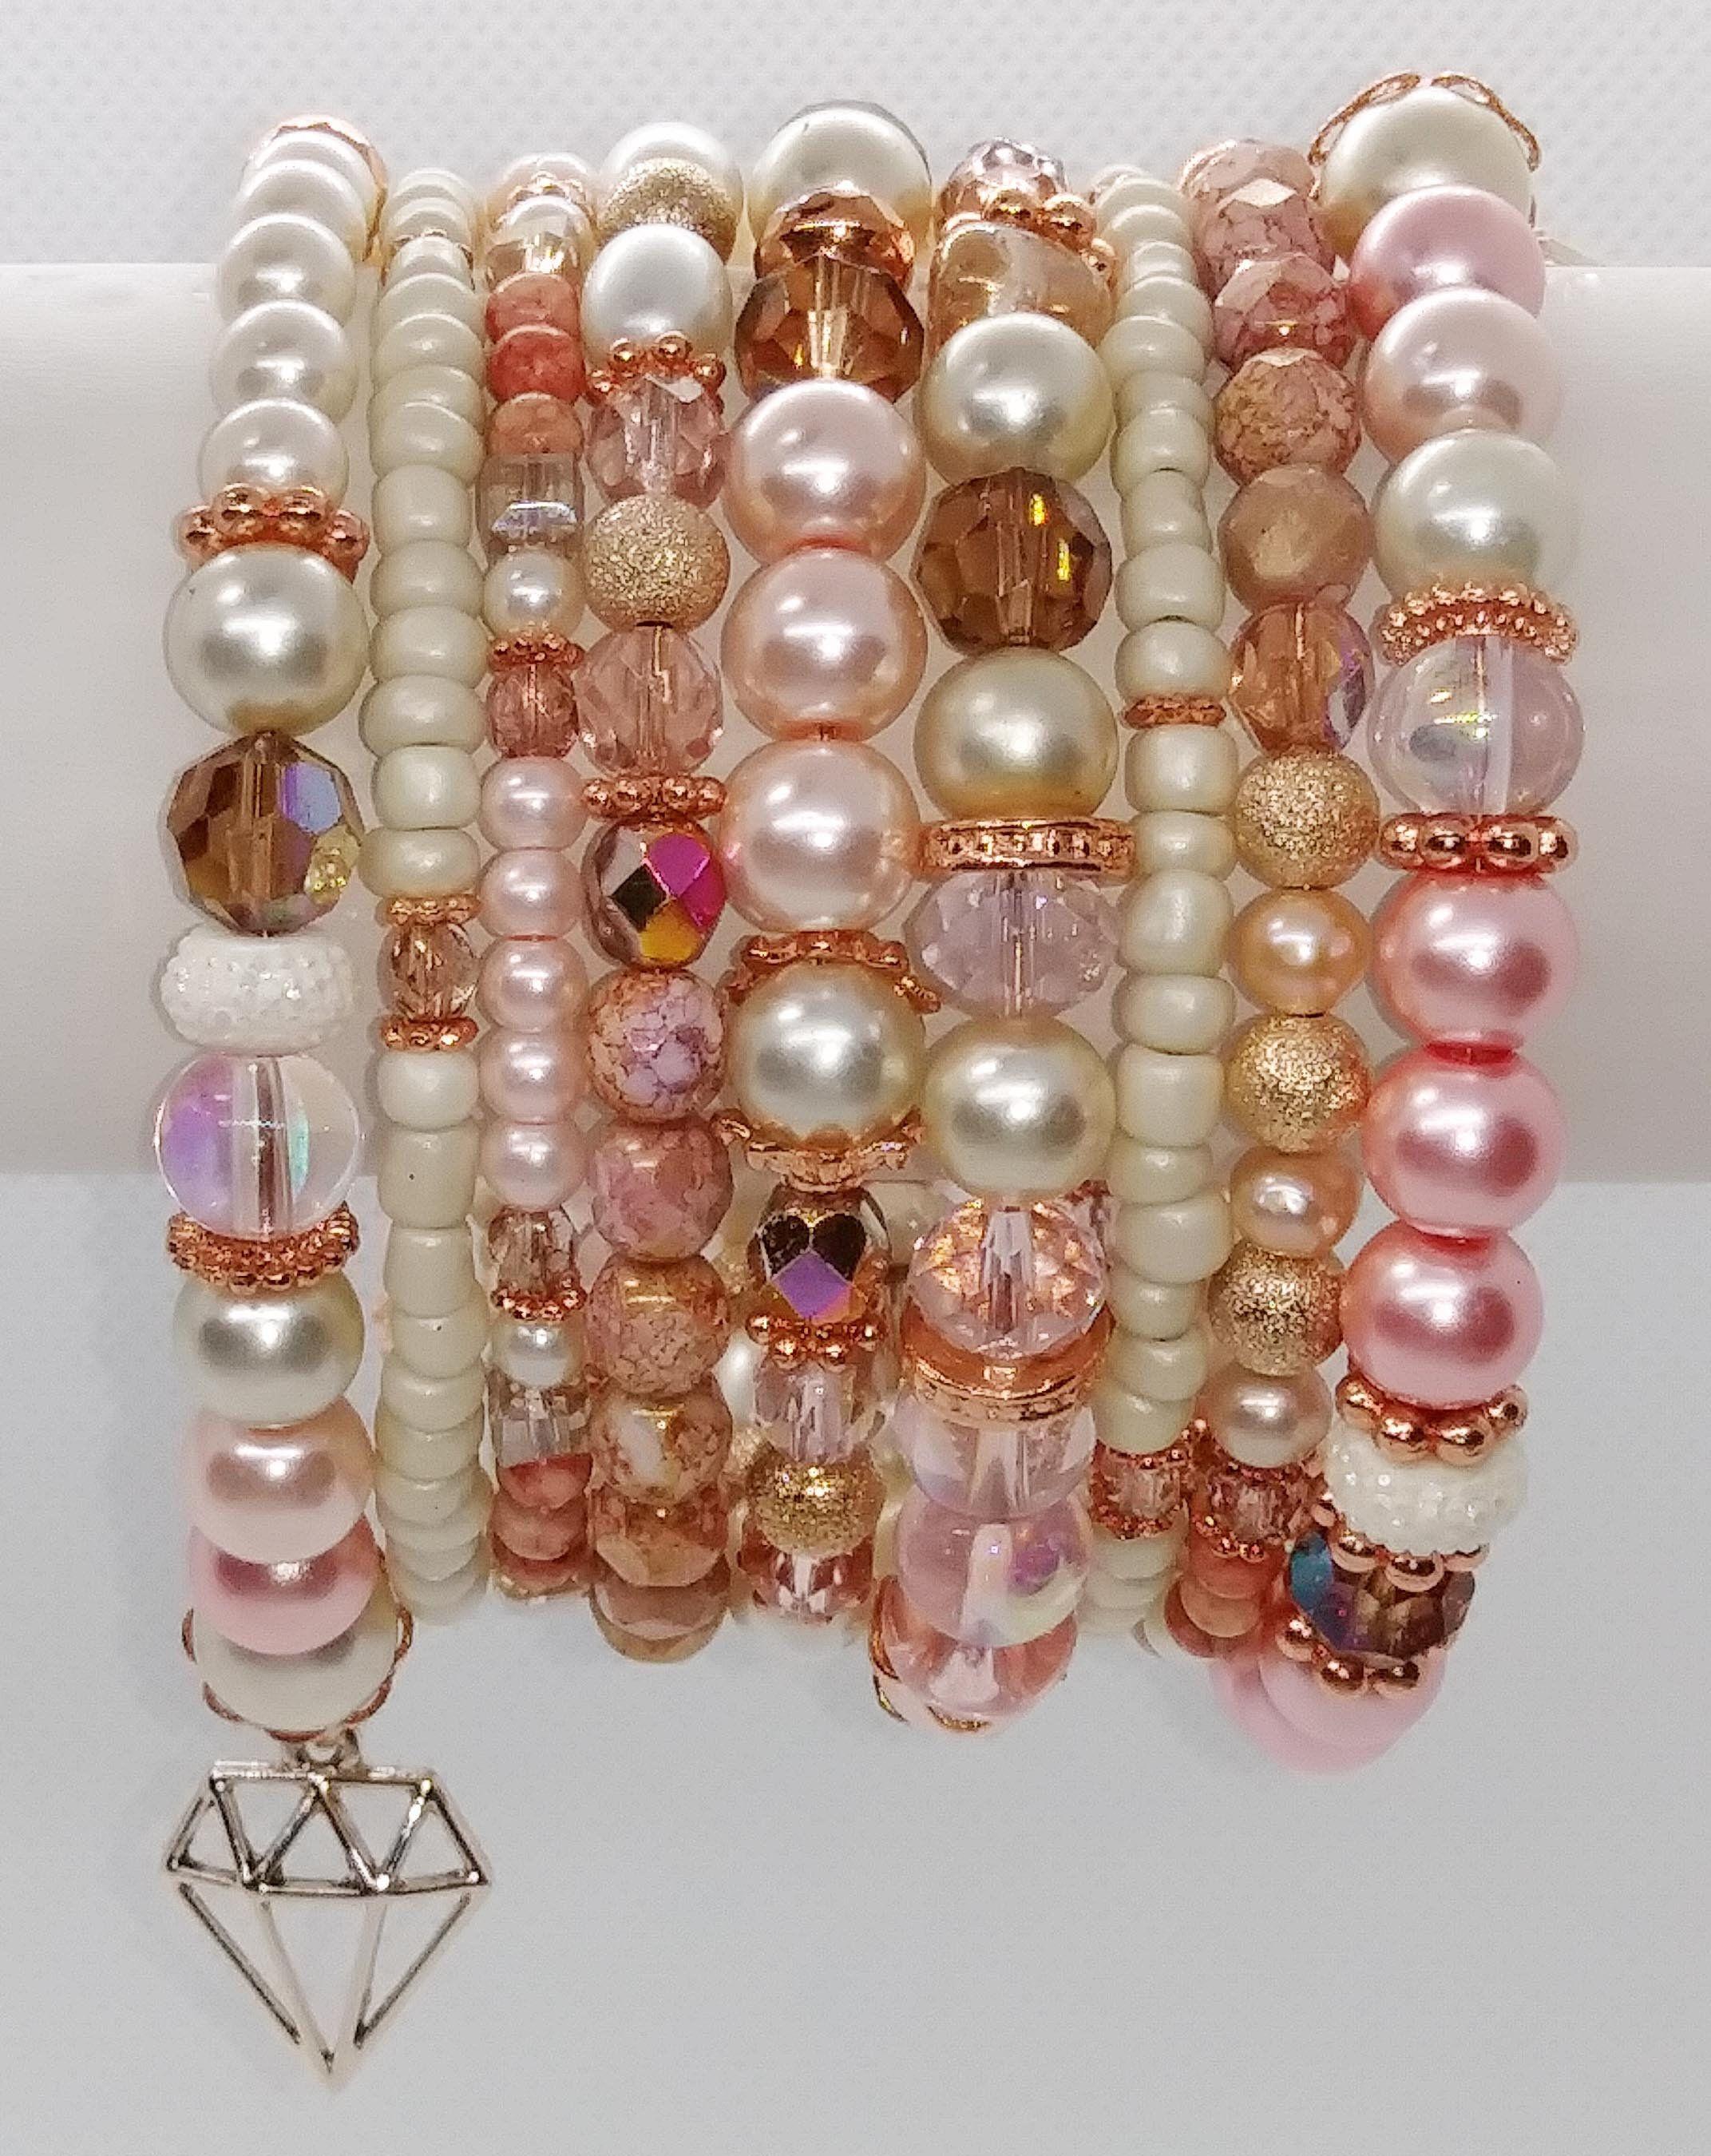 Blushing Bride wire bracelet